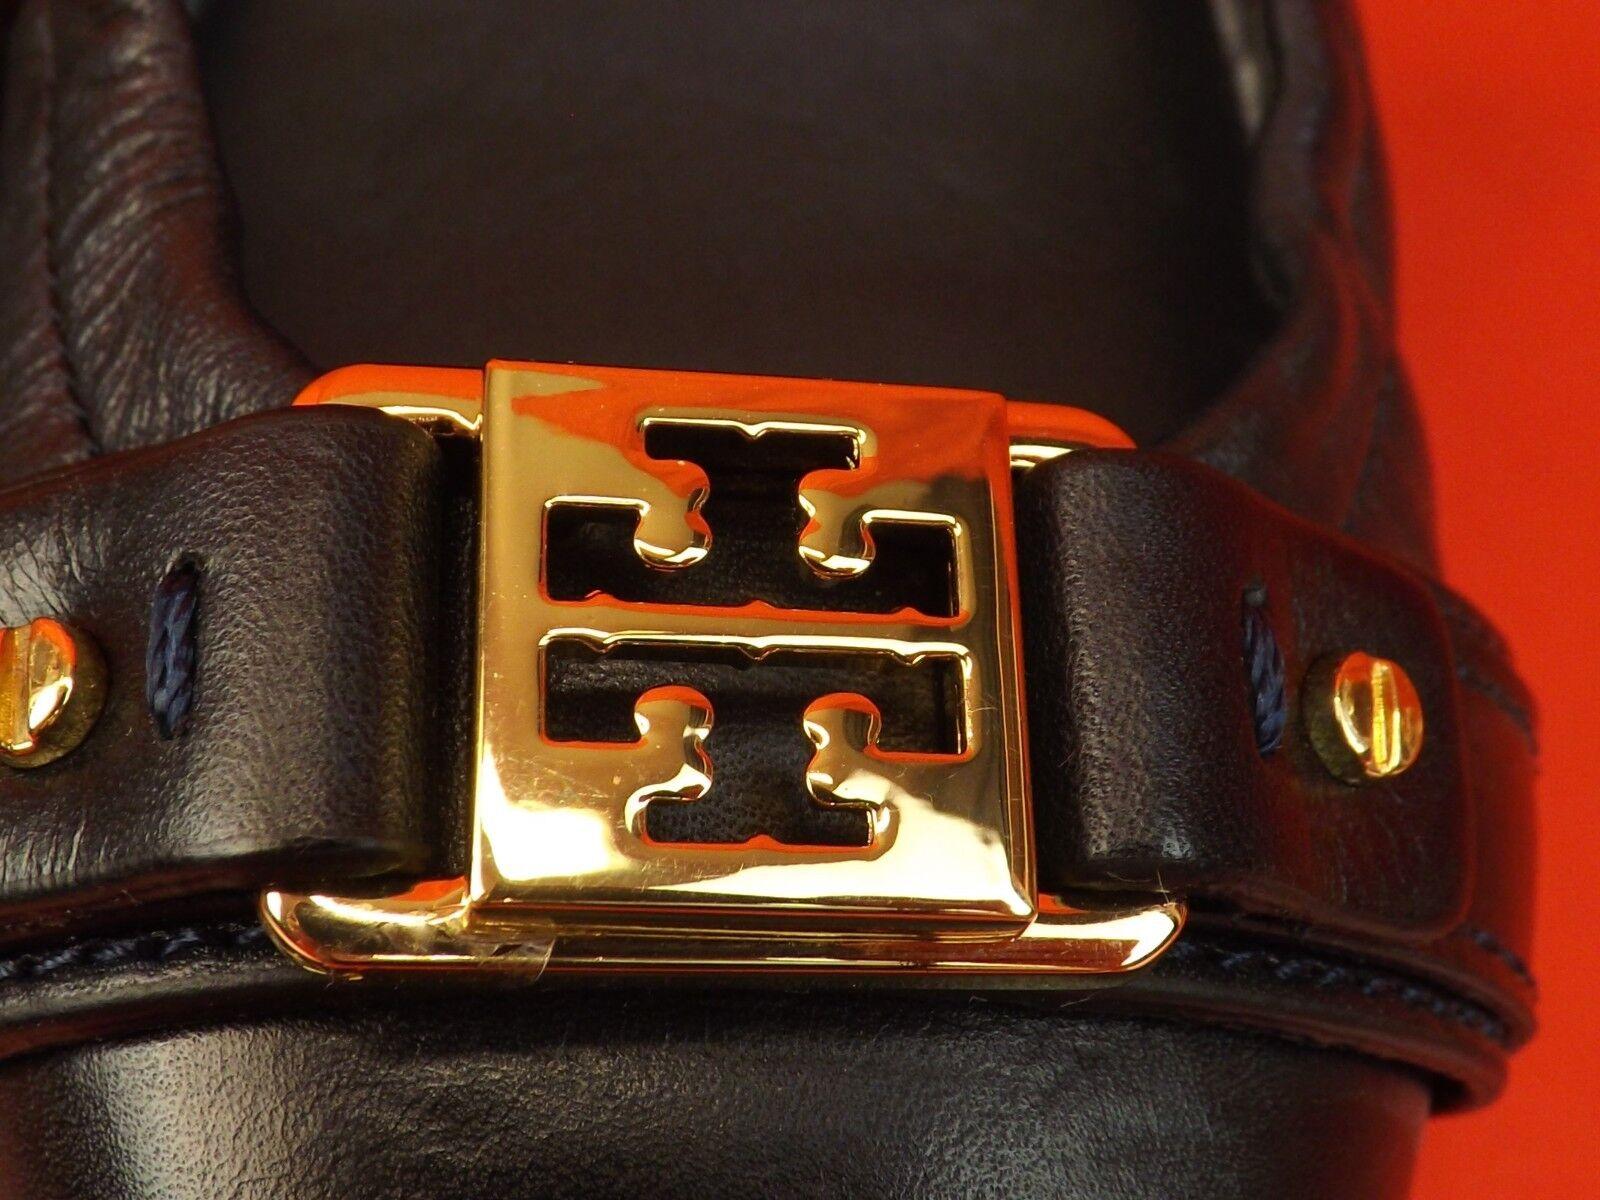 NIB TORY BURCH BURCH BURCH NAVY LEATHER AMBpink gold REVA CAP TOE BALLET FLATS 8 0f2a5c